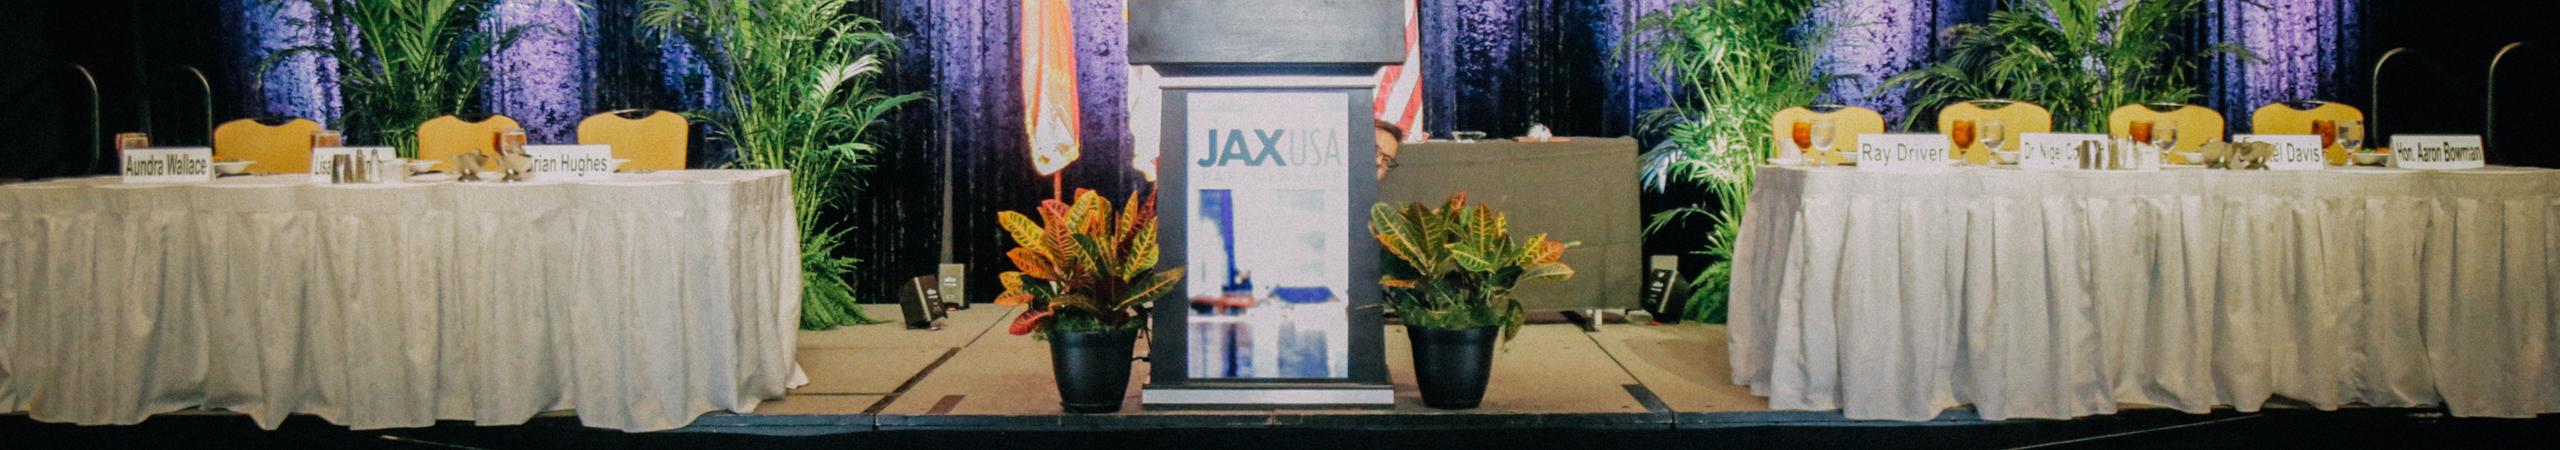 Jax Chamber-4th Quarter JaxUSA Luncheon